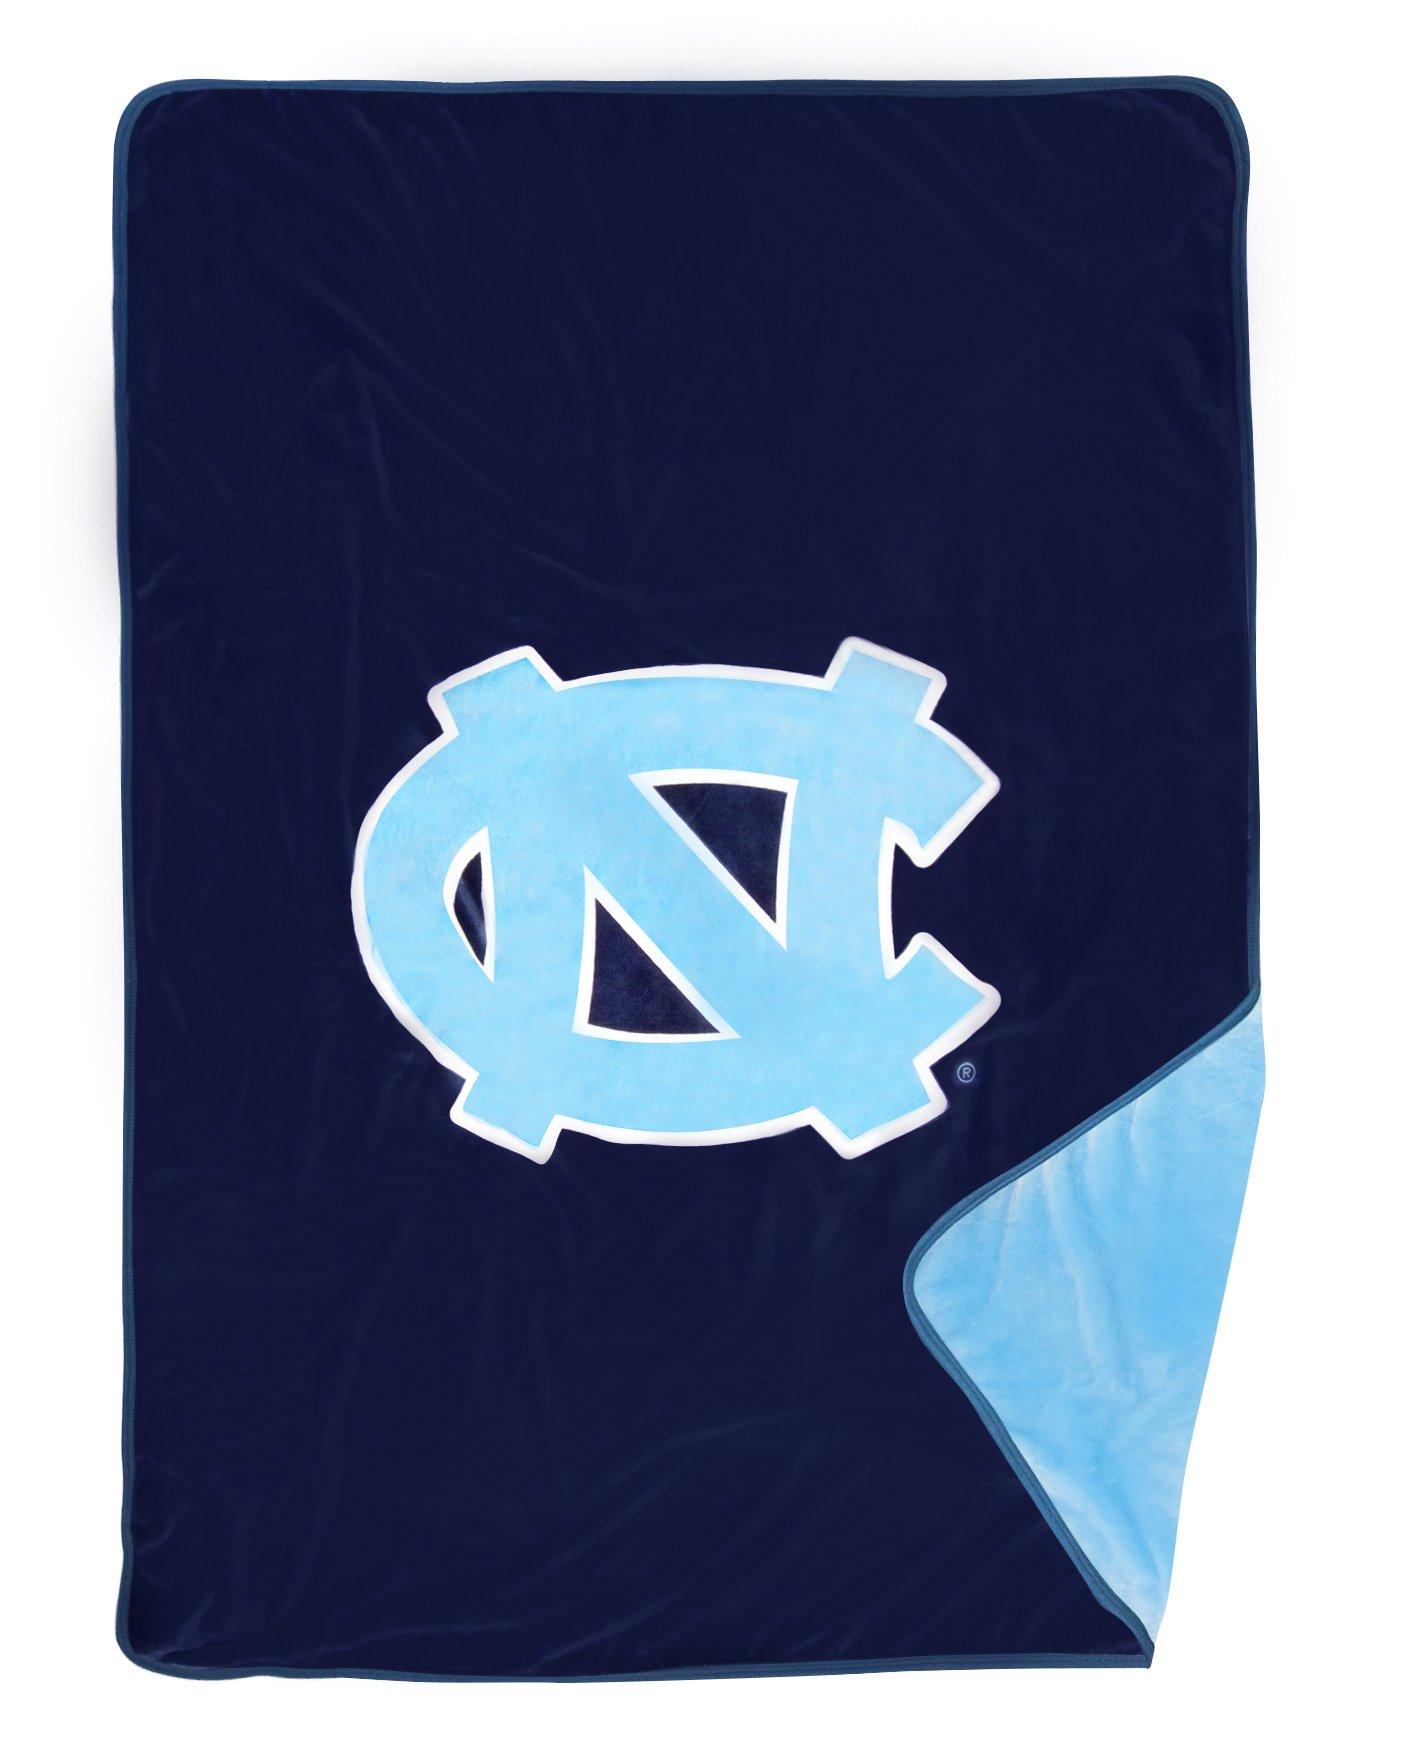 Dormitory 101 New to Market! UNC Chapel Hill Tar Heels Premium Plush Fleece Blanket - 60''X80''